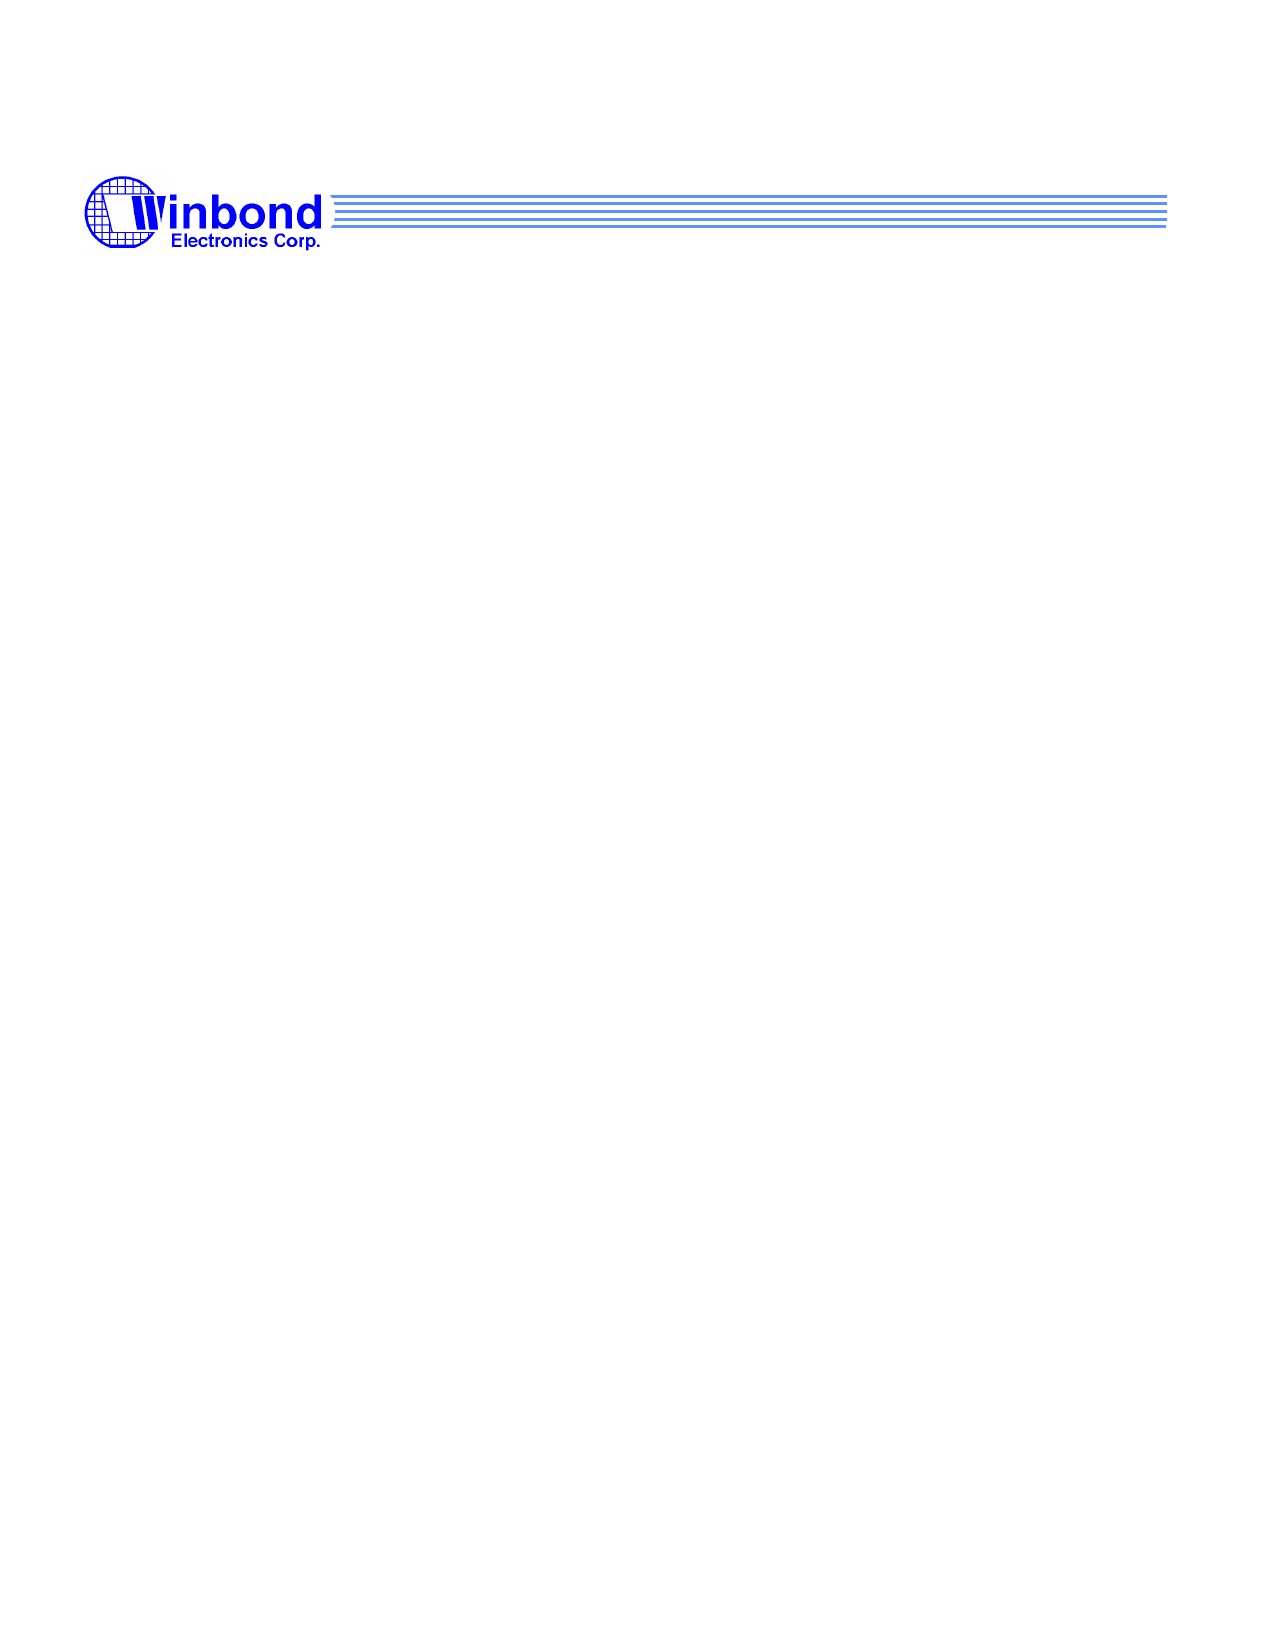 I5216E datasheet